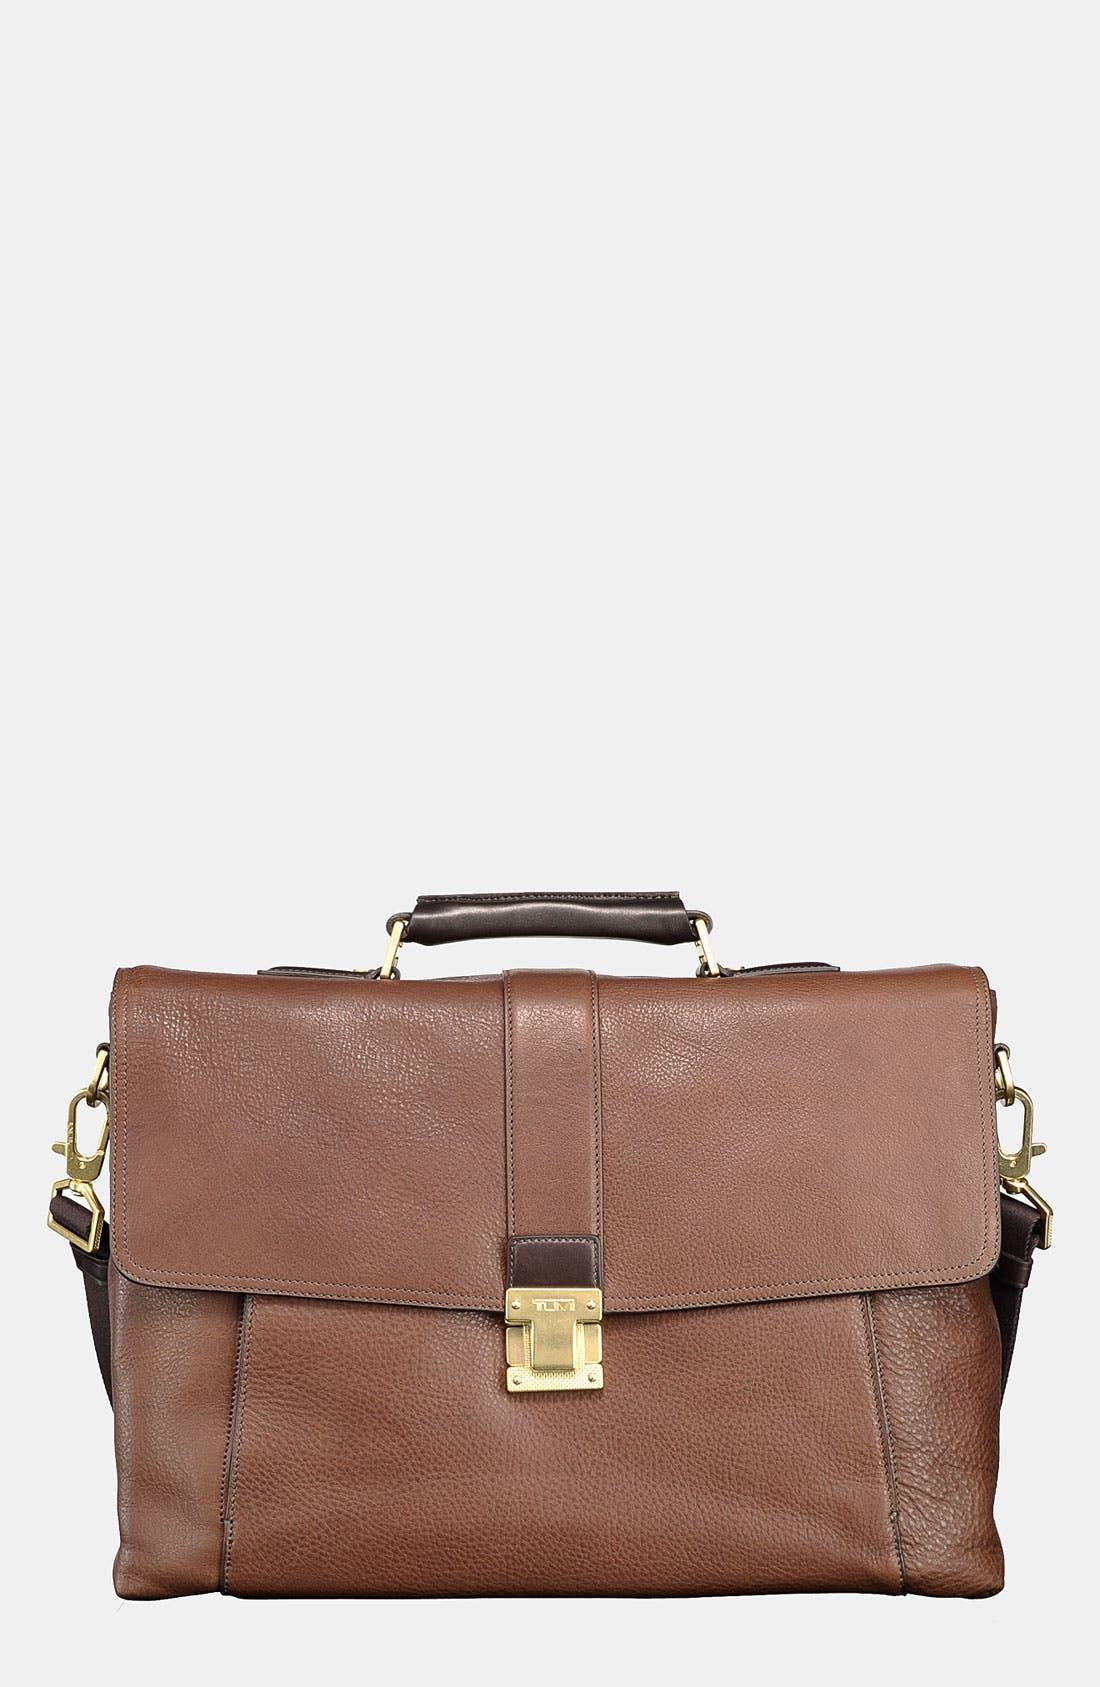 Alternate Image 1 Selected - Tumi 'Beacon Hill - Cambridge' Flap Briefcase